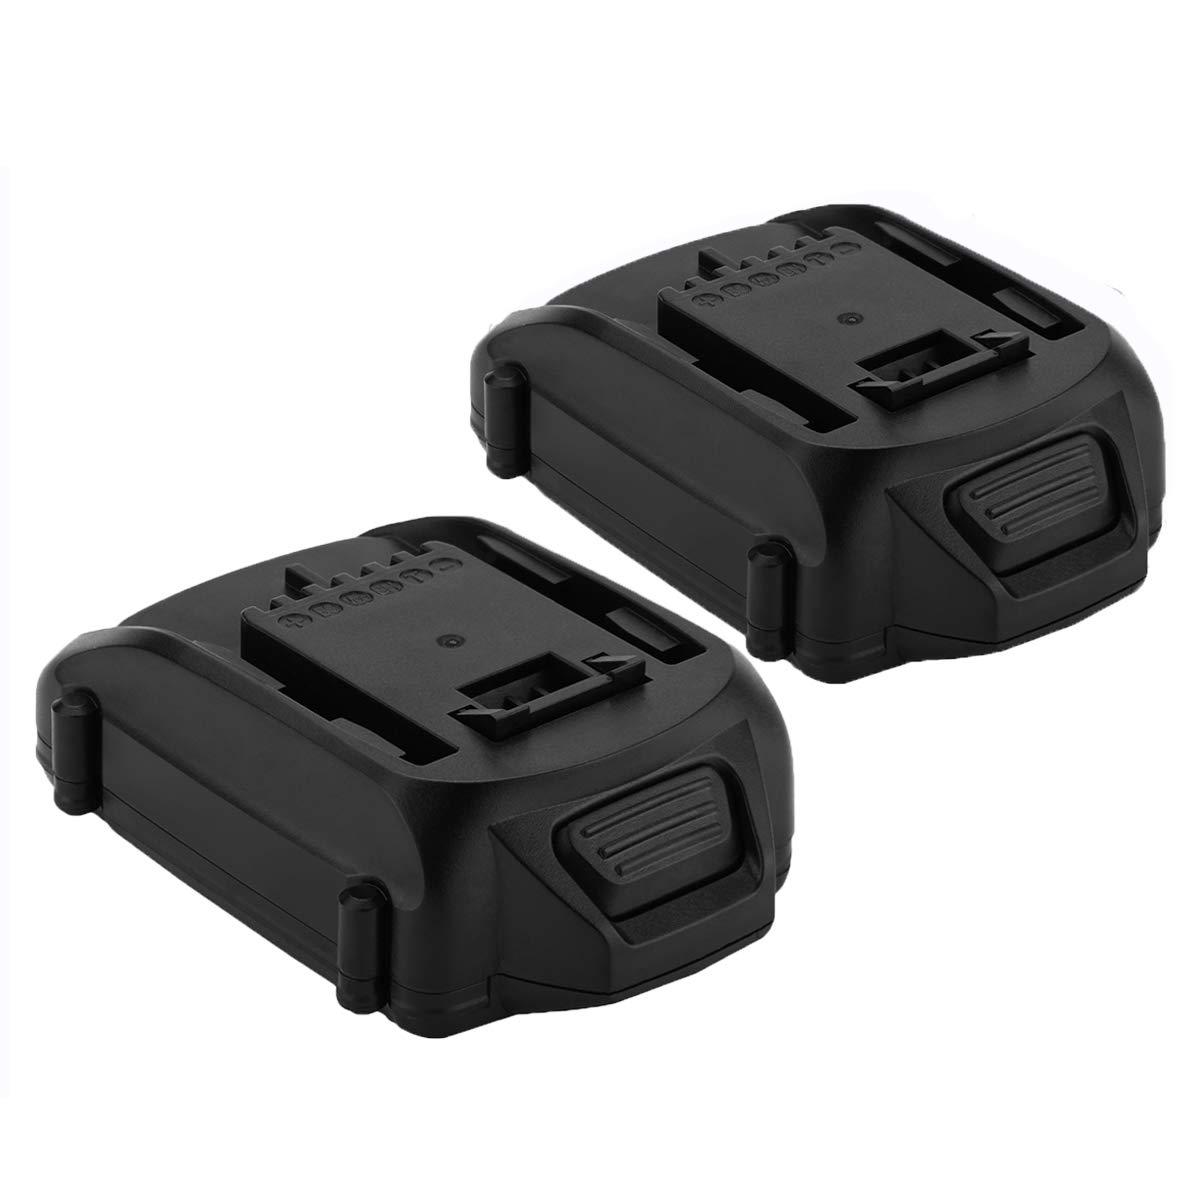 Exmate 2 Pack 18V 2.5Ah Li-ion Replacement Battery for Worx WA3511 WA3512 WA3512.1 WA3523 WG151 WG151E WU287 WU381 WX163 Cordless Tools